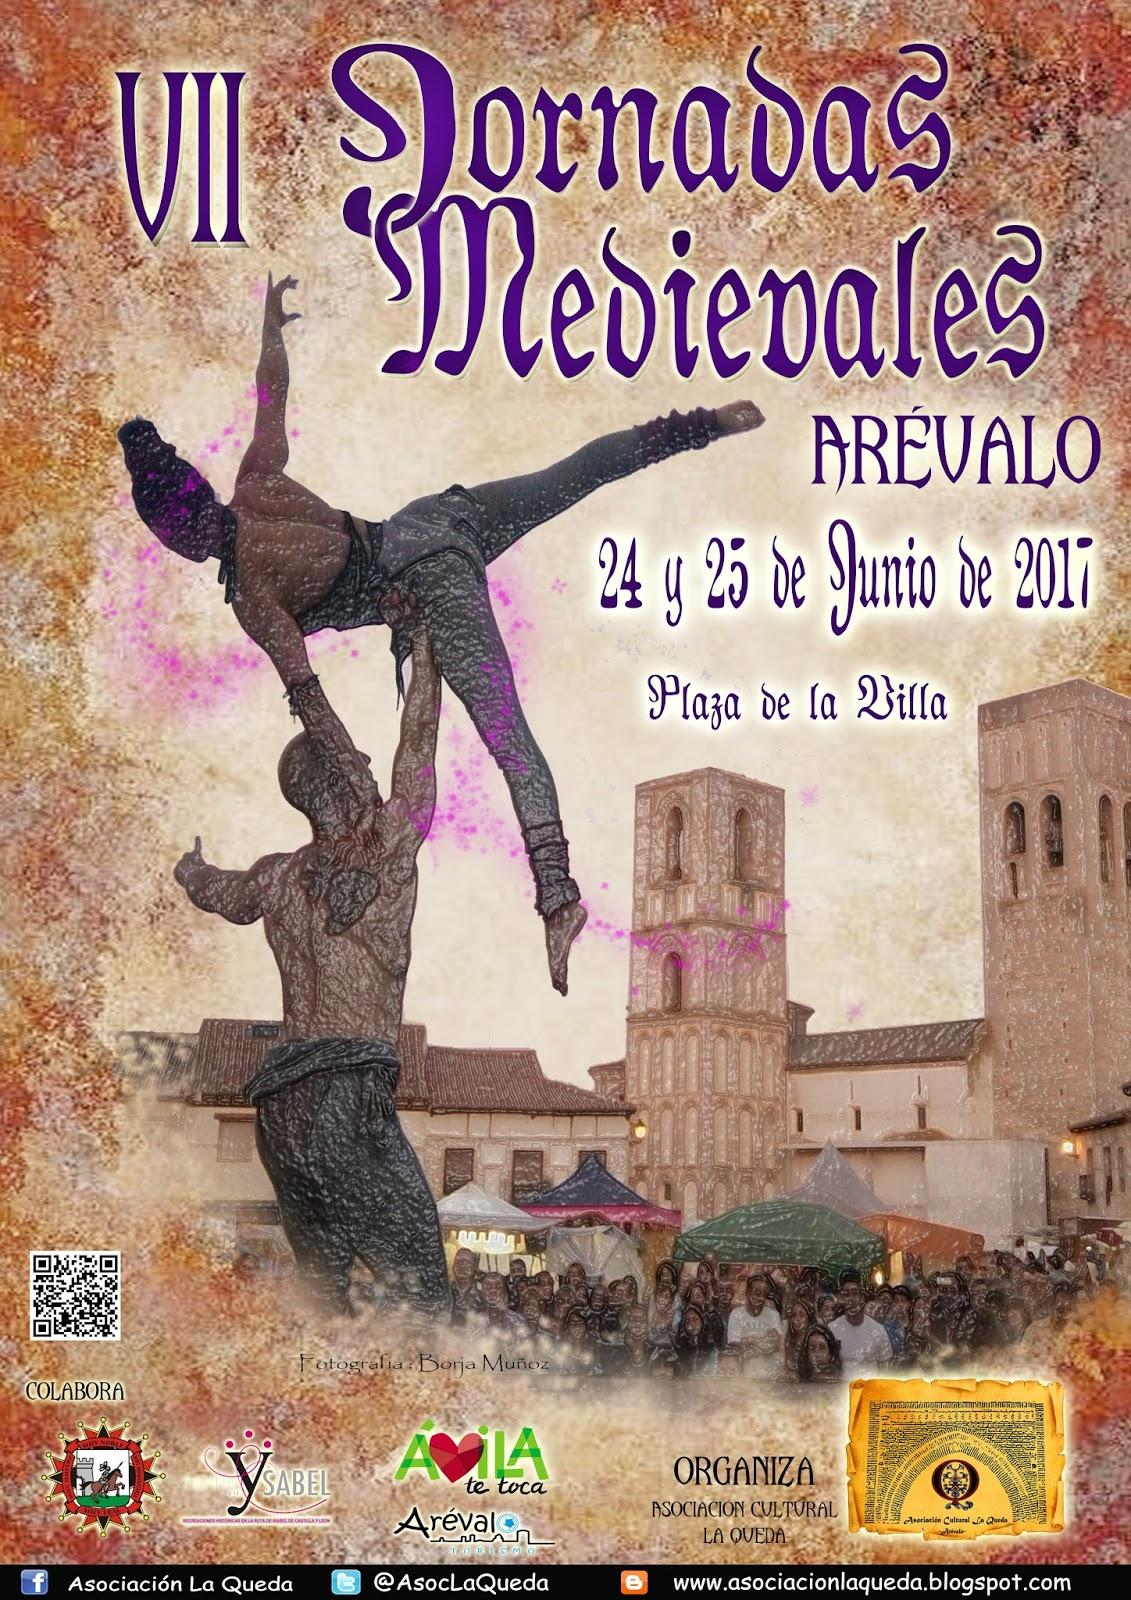 VII Jornadas Medievales de arevalo